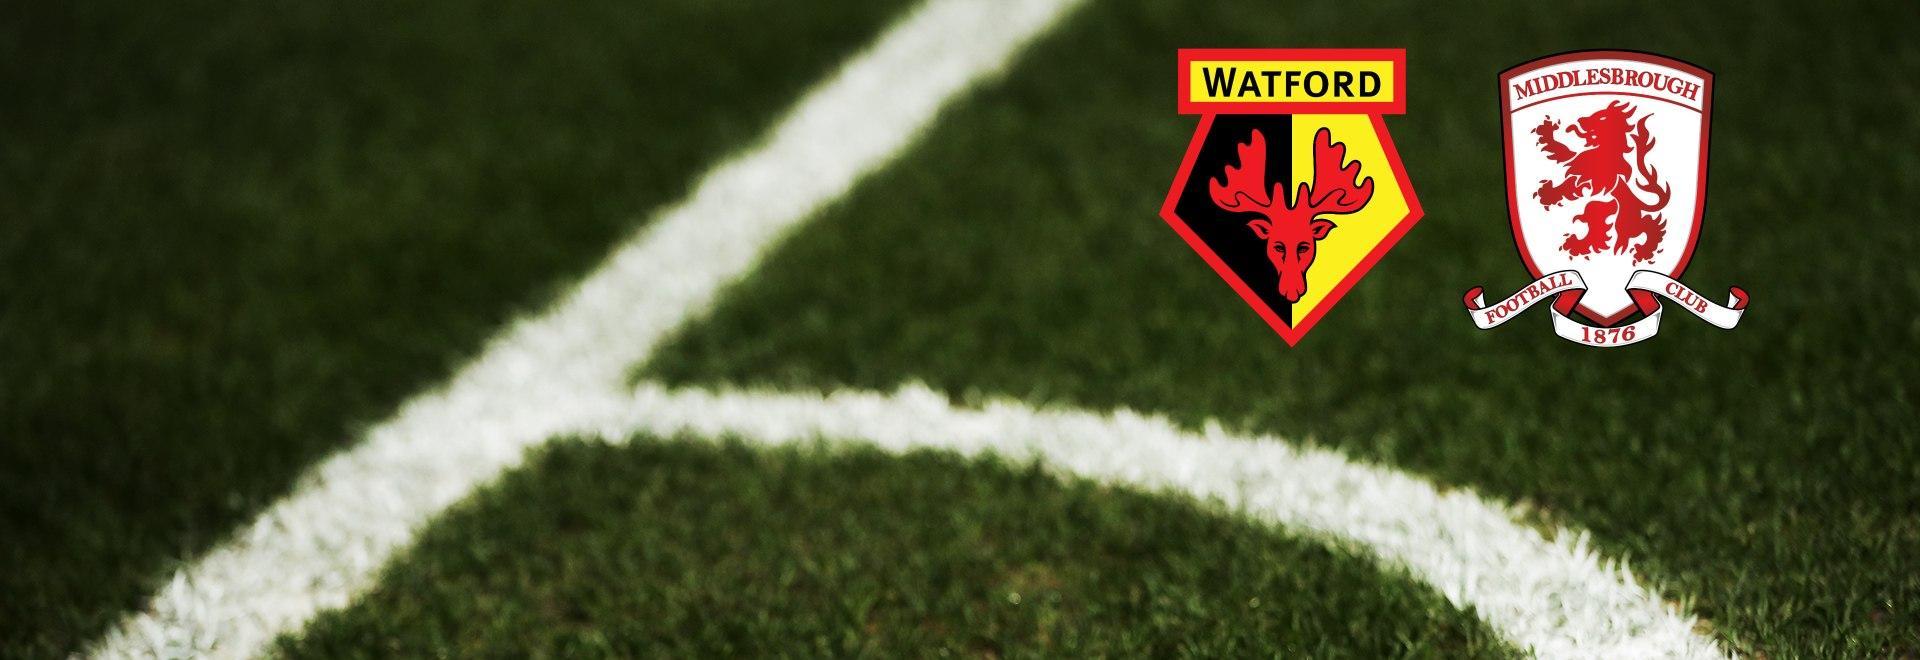 Watford - Middlesbrough. 1a g.